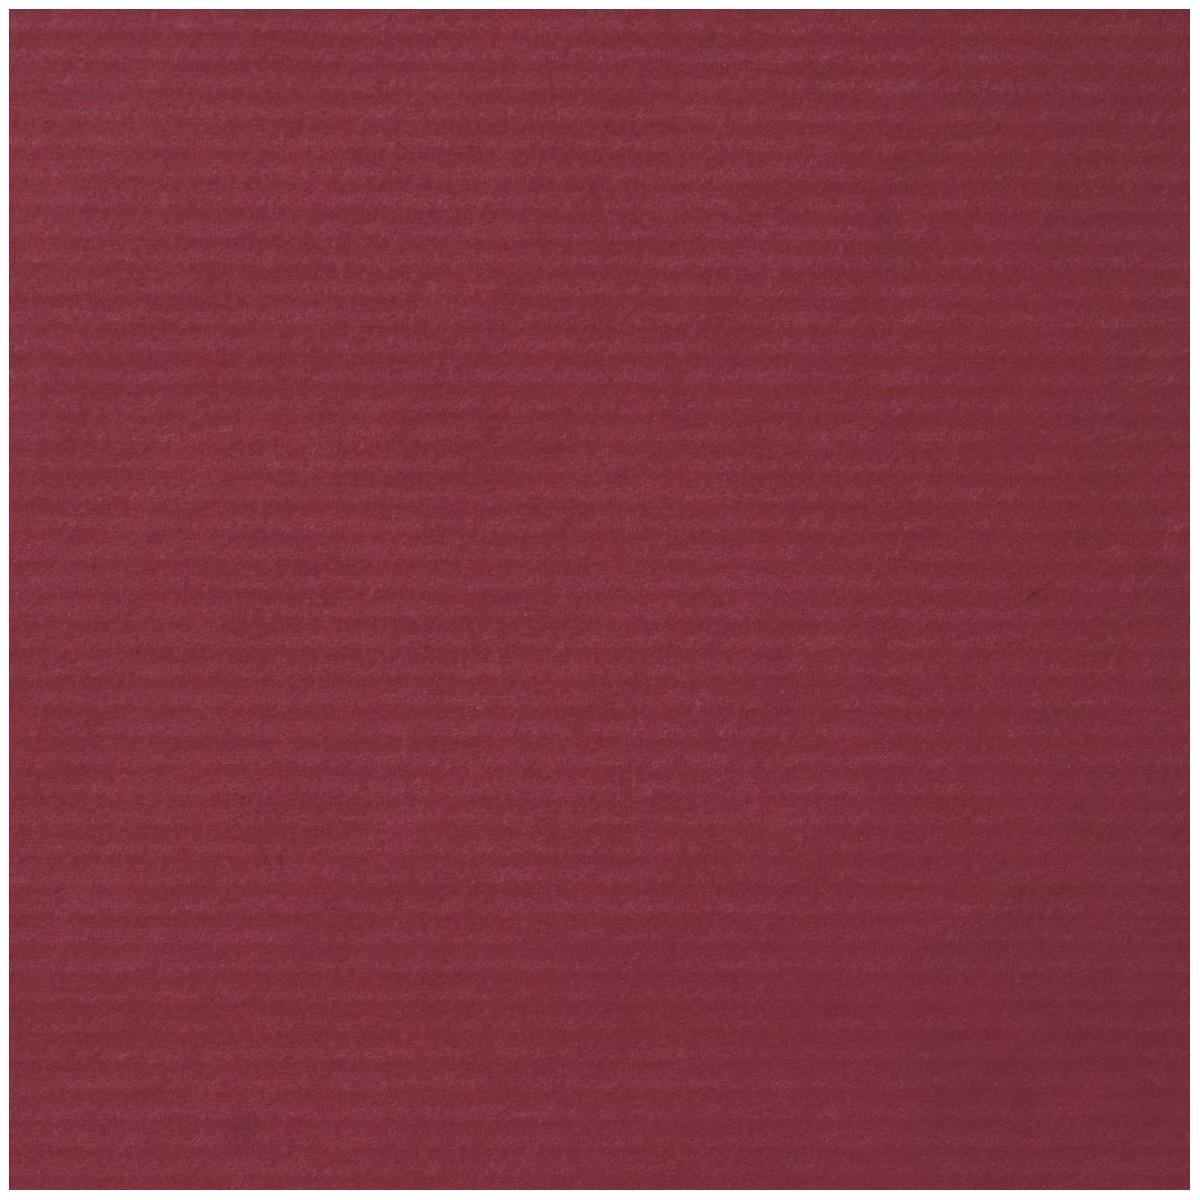 Carta Sealing Avana ECOBROWN Gr.60 Fogli Cm.70x100 Colori Tinta Unita (al Kg.) Bordeaux